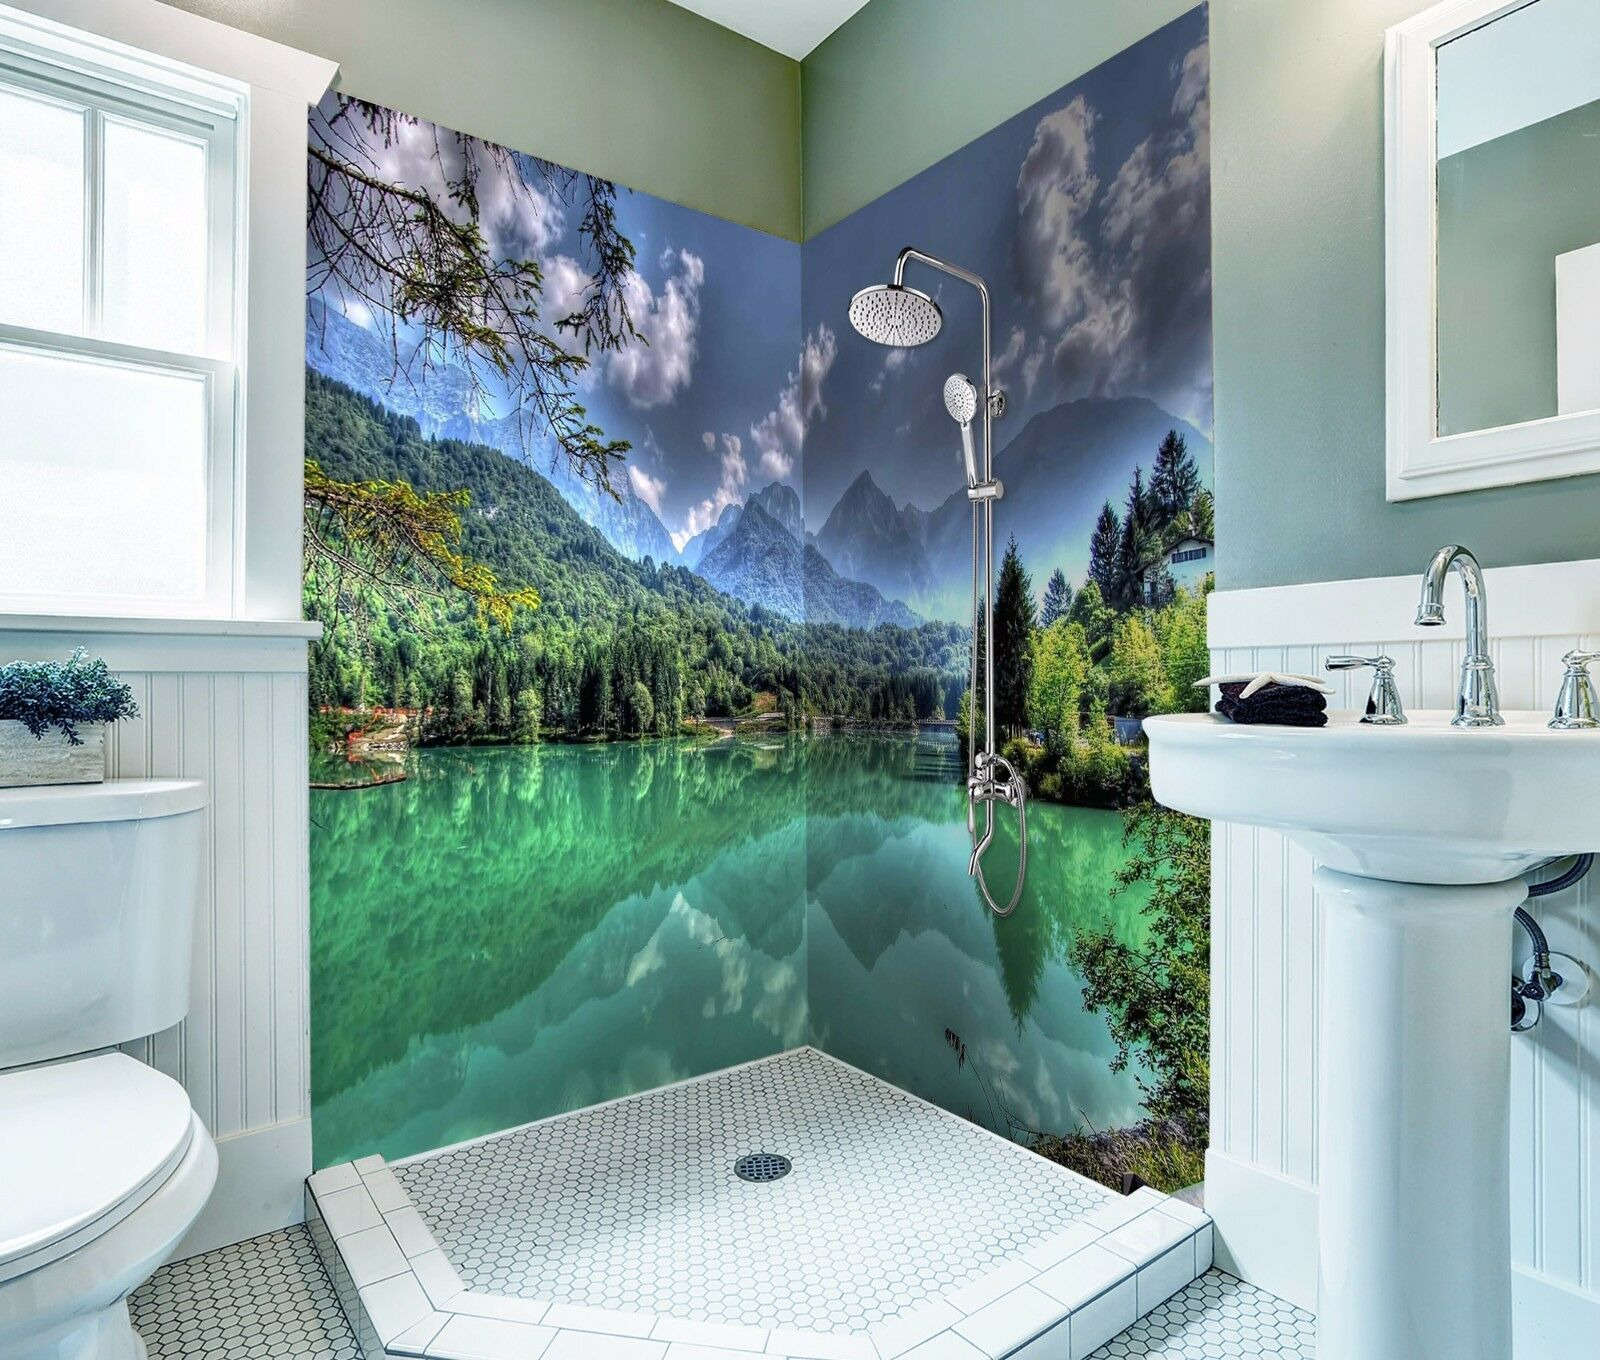 3D 3D 3D Mountain River 433 WallPaper Bathroom Print Decal Wall Deco AJ WALLPAPER AU 14ac45